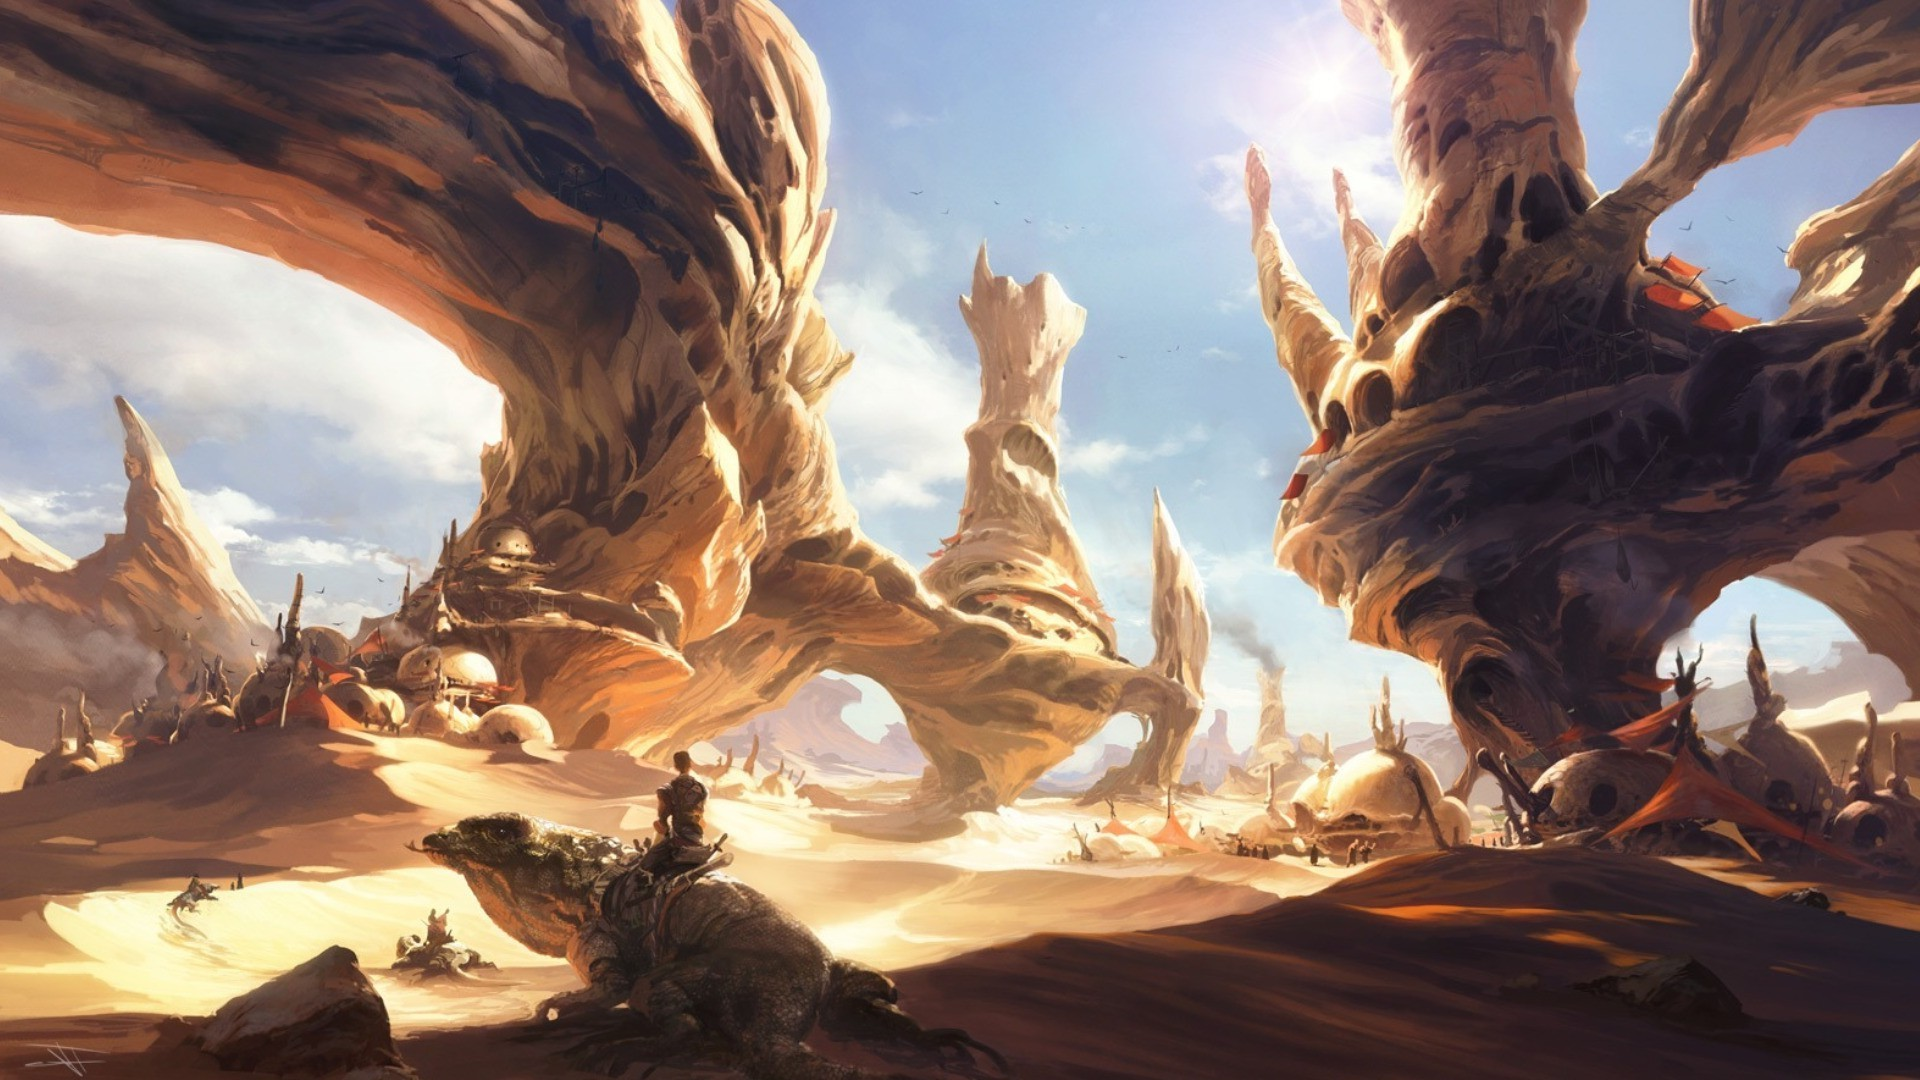 desert, Luke Skywalker, Star Wars Wallpapers HD / Desktop and Mobile  Backgrounds